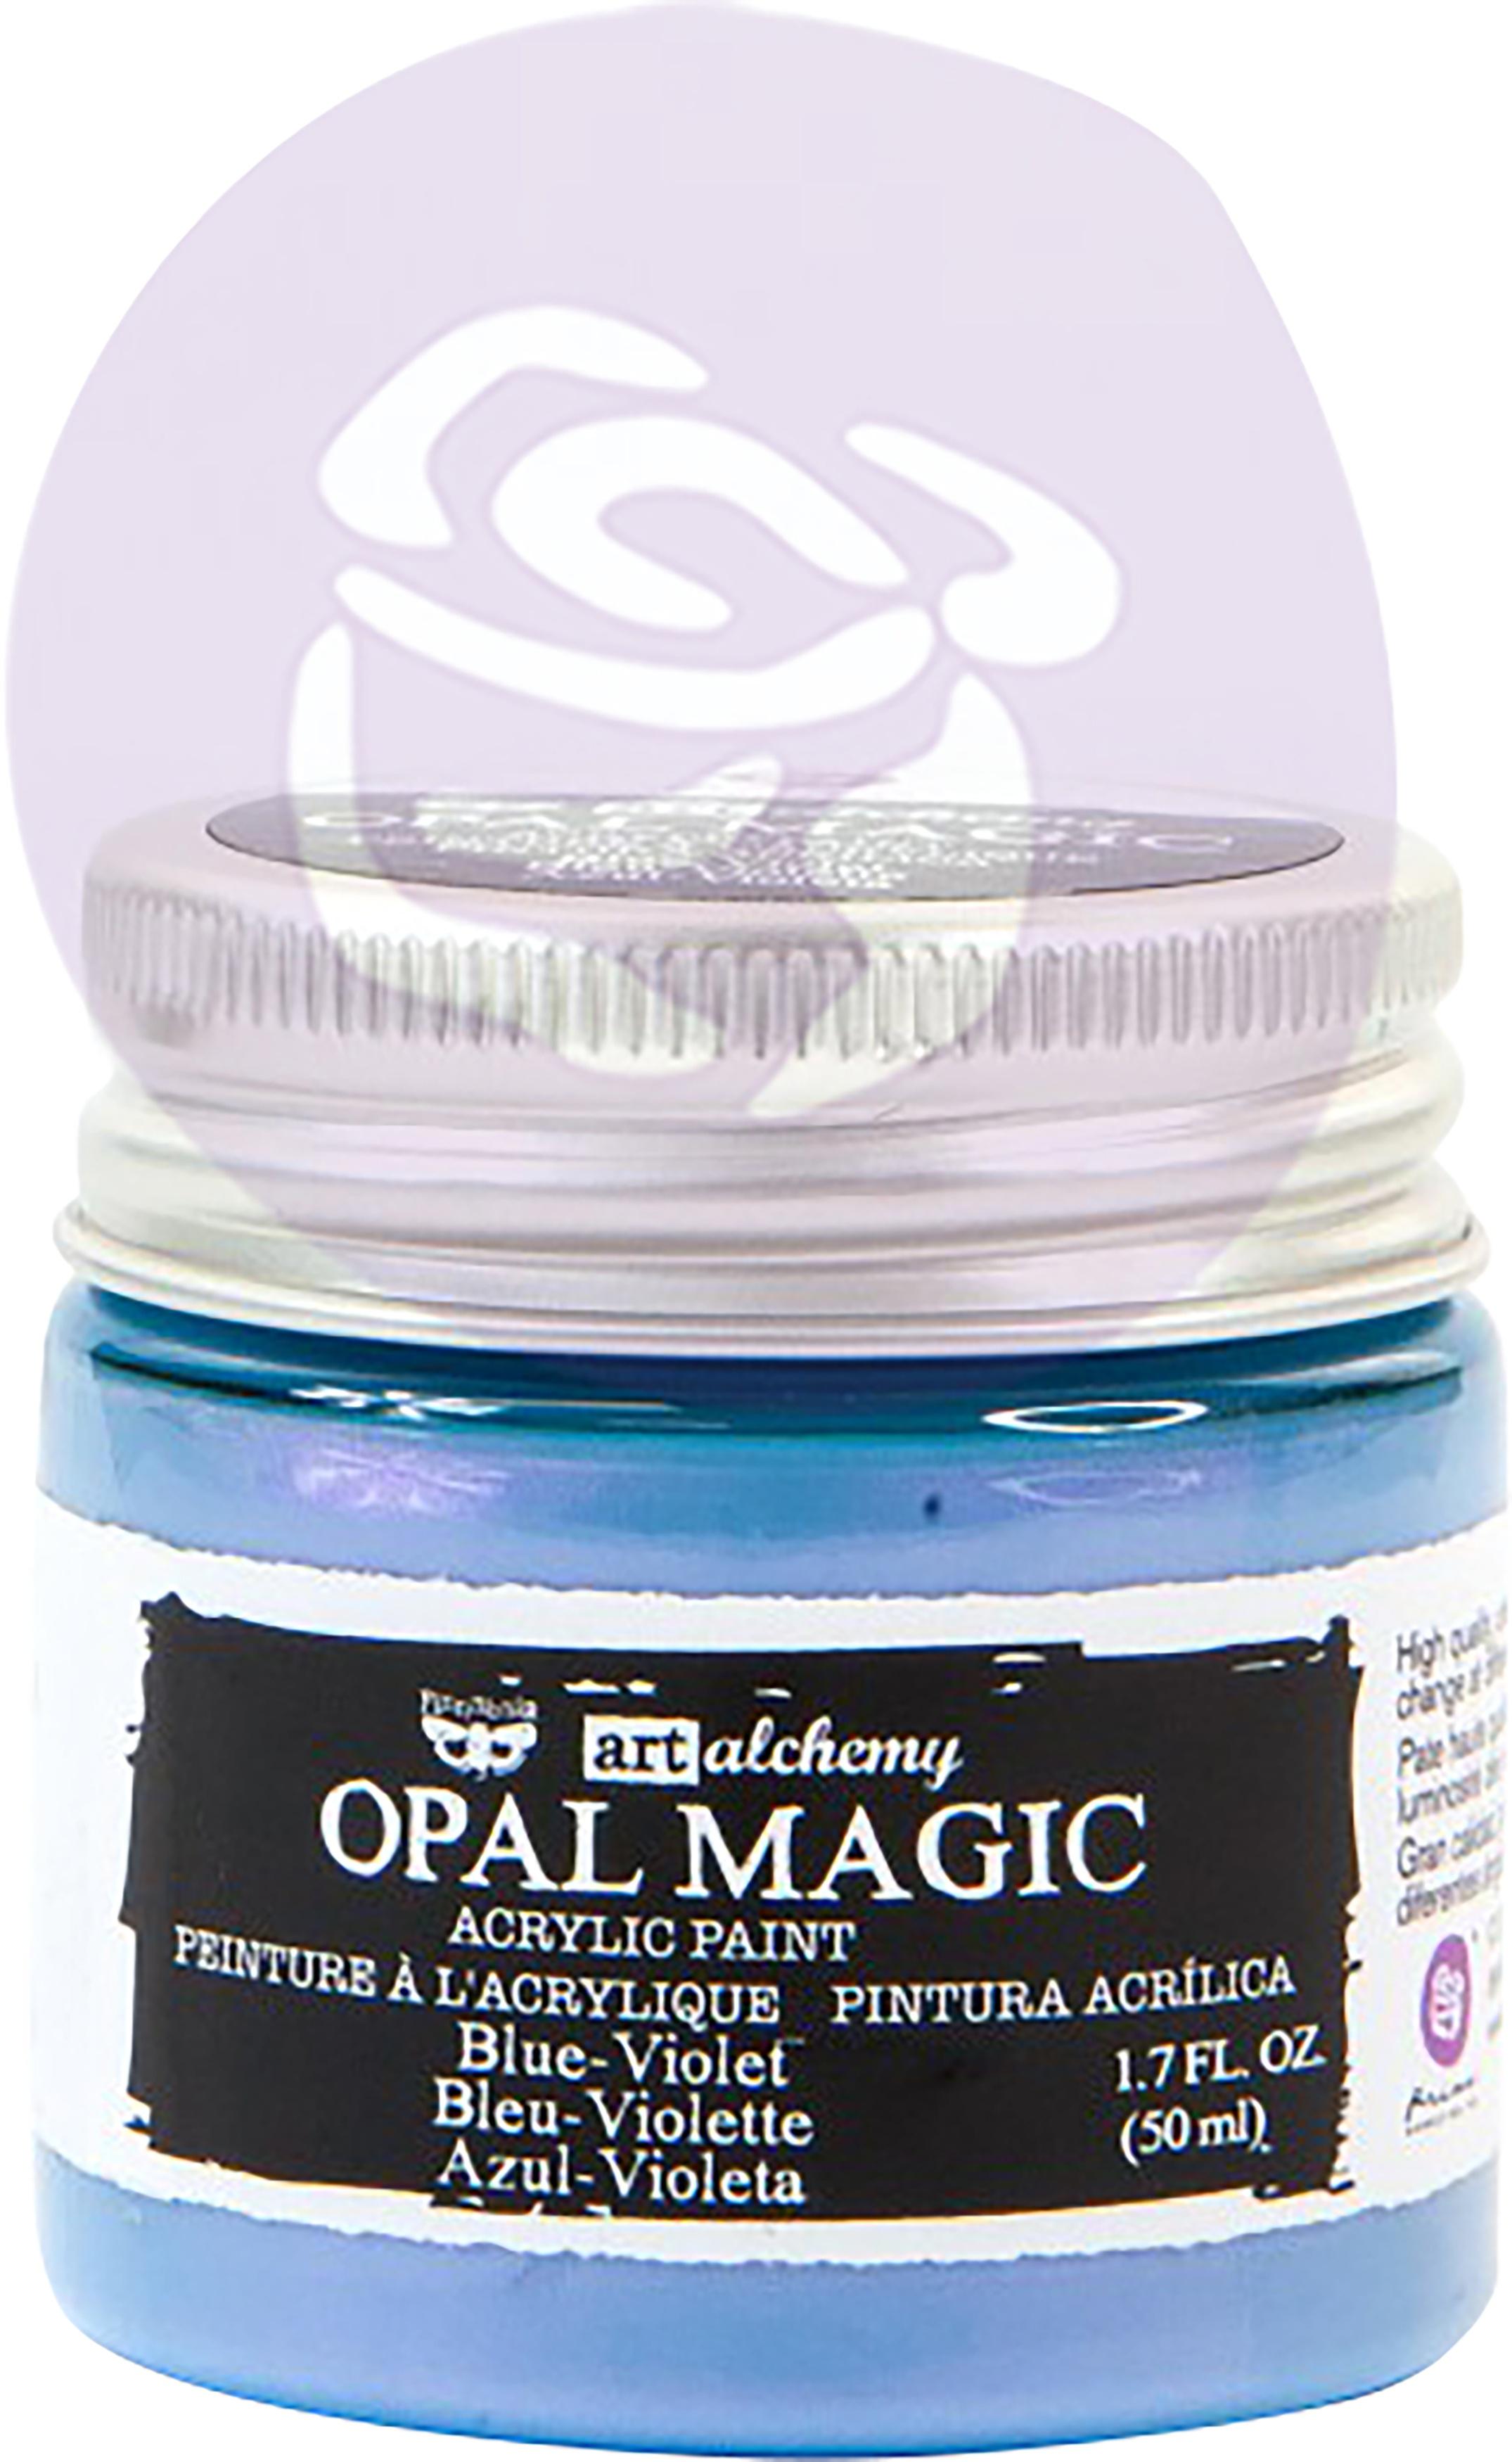 Opal Magic - Blue/Violet